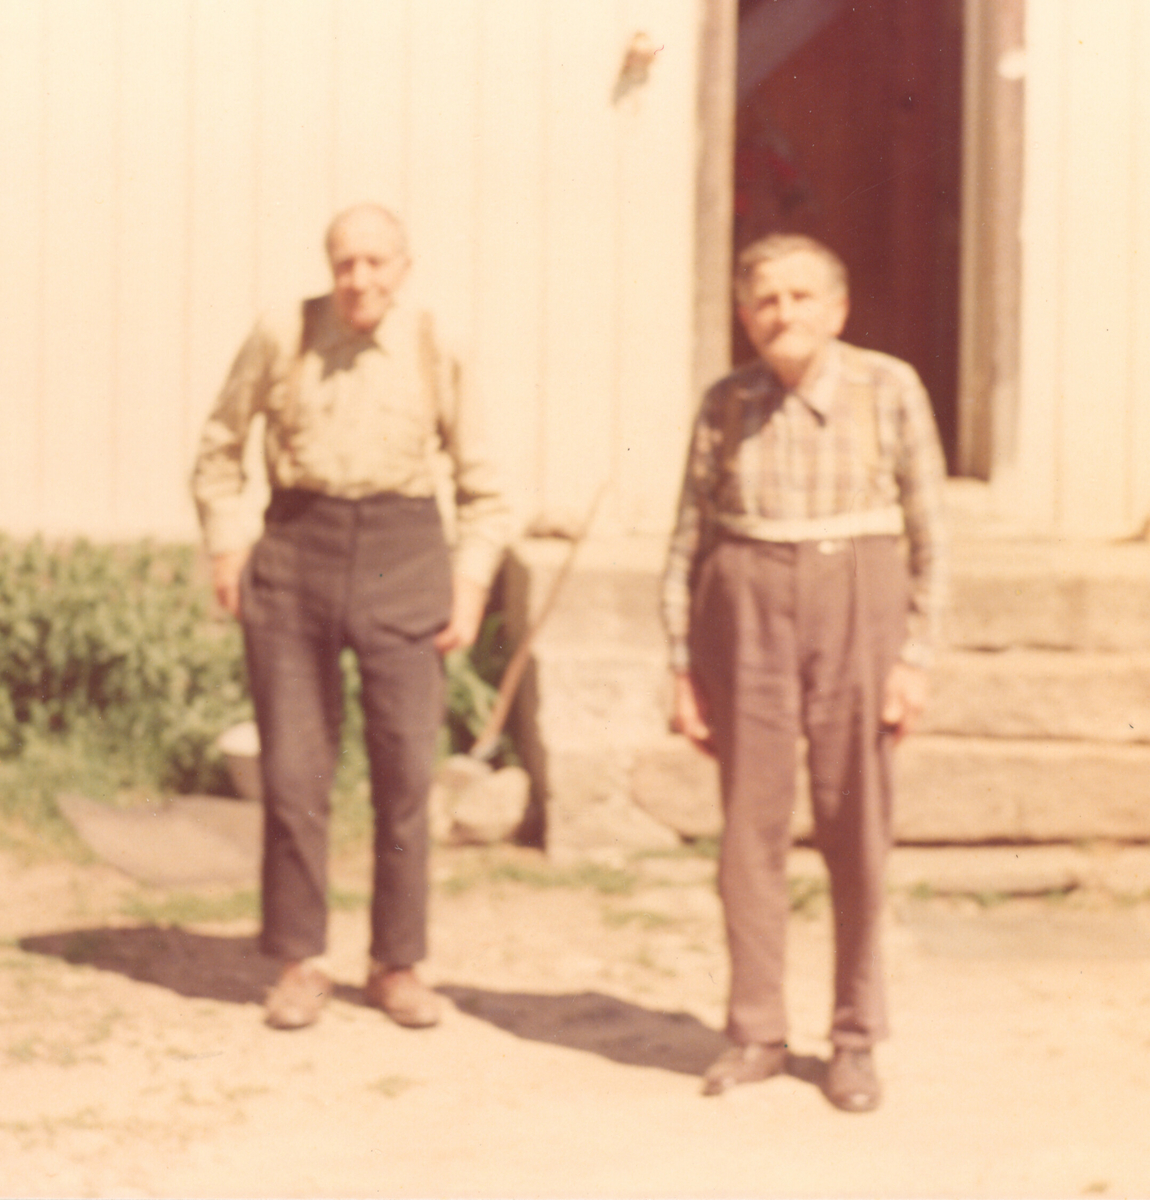 To eldre menn